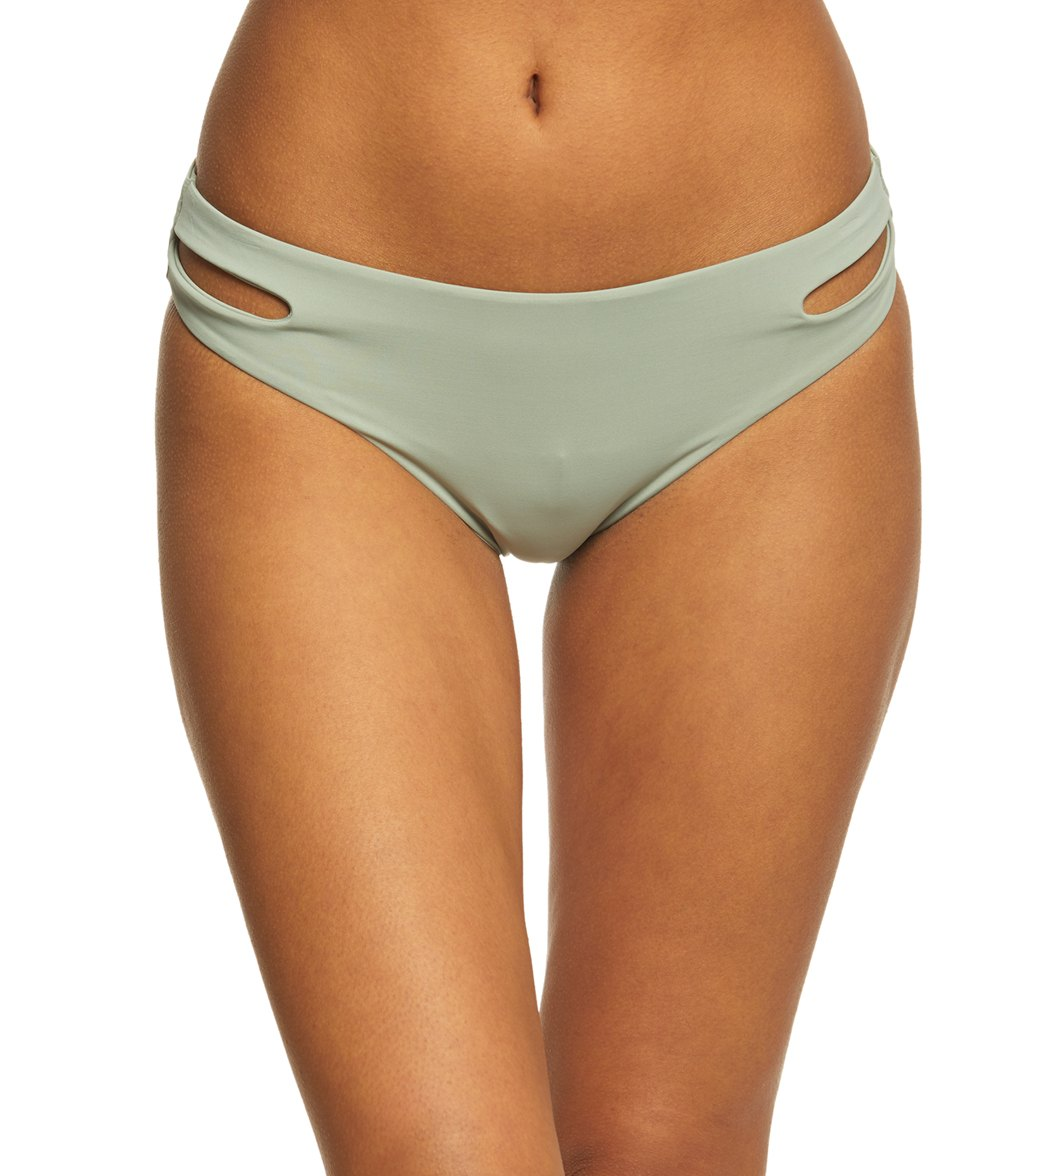 2dc0b38da78 Roxy Women's Solid Softly Love Reversible 70's Pant Bikini Bottom at  SwimOutlet.com